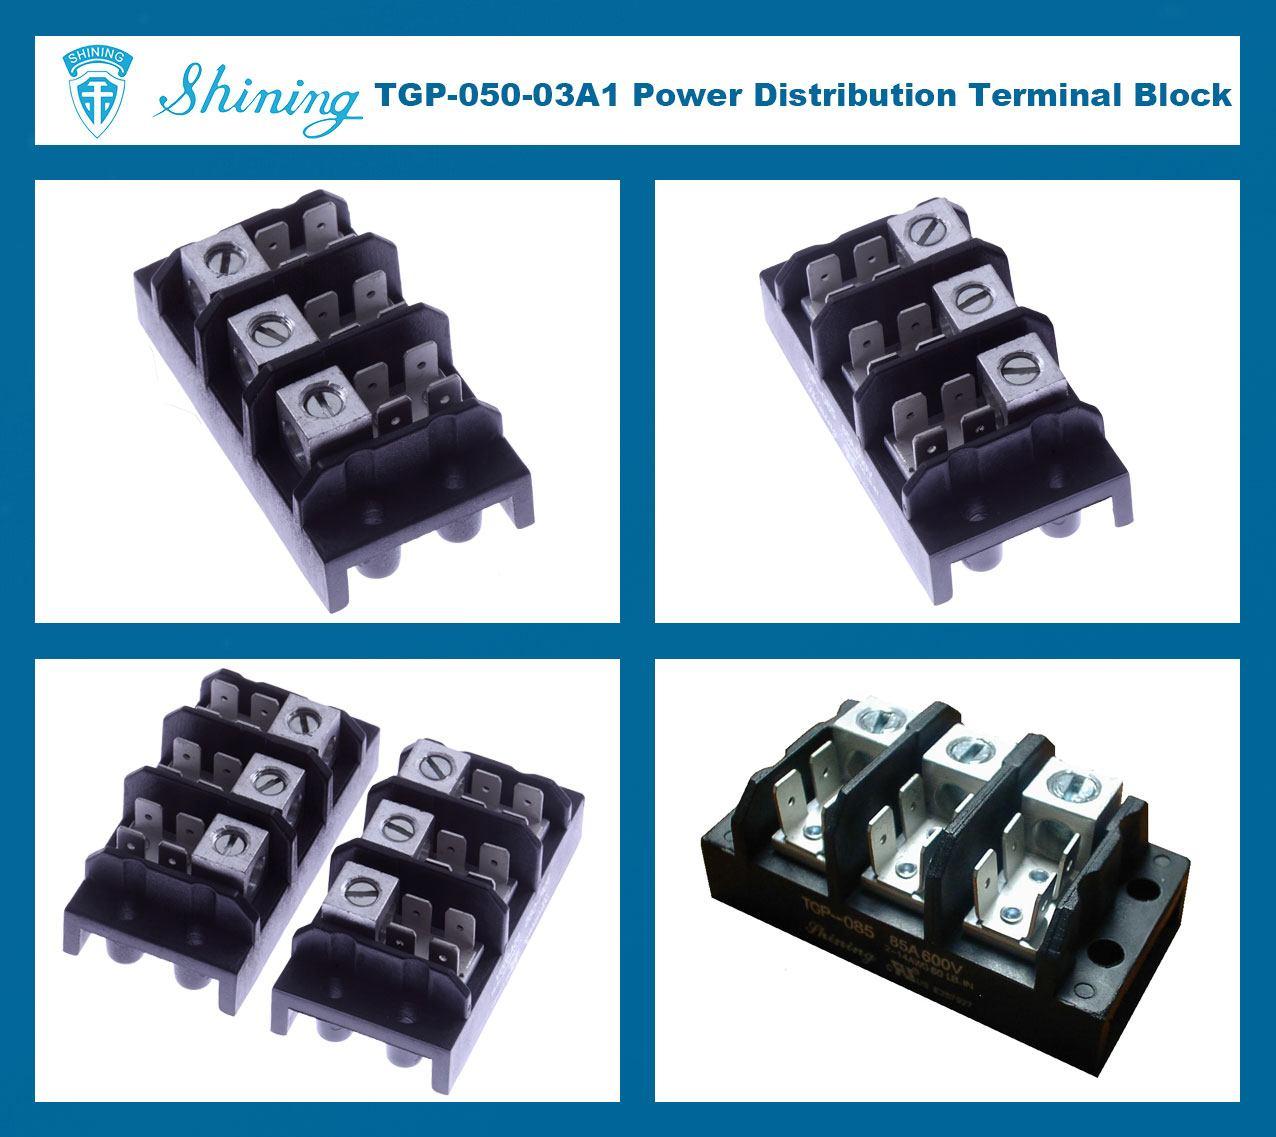 TGP-050-03A1 600V 50A 3 Pole Electrical Power Terminal Block